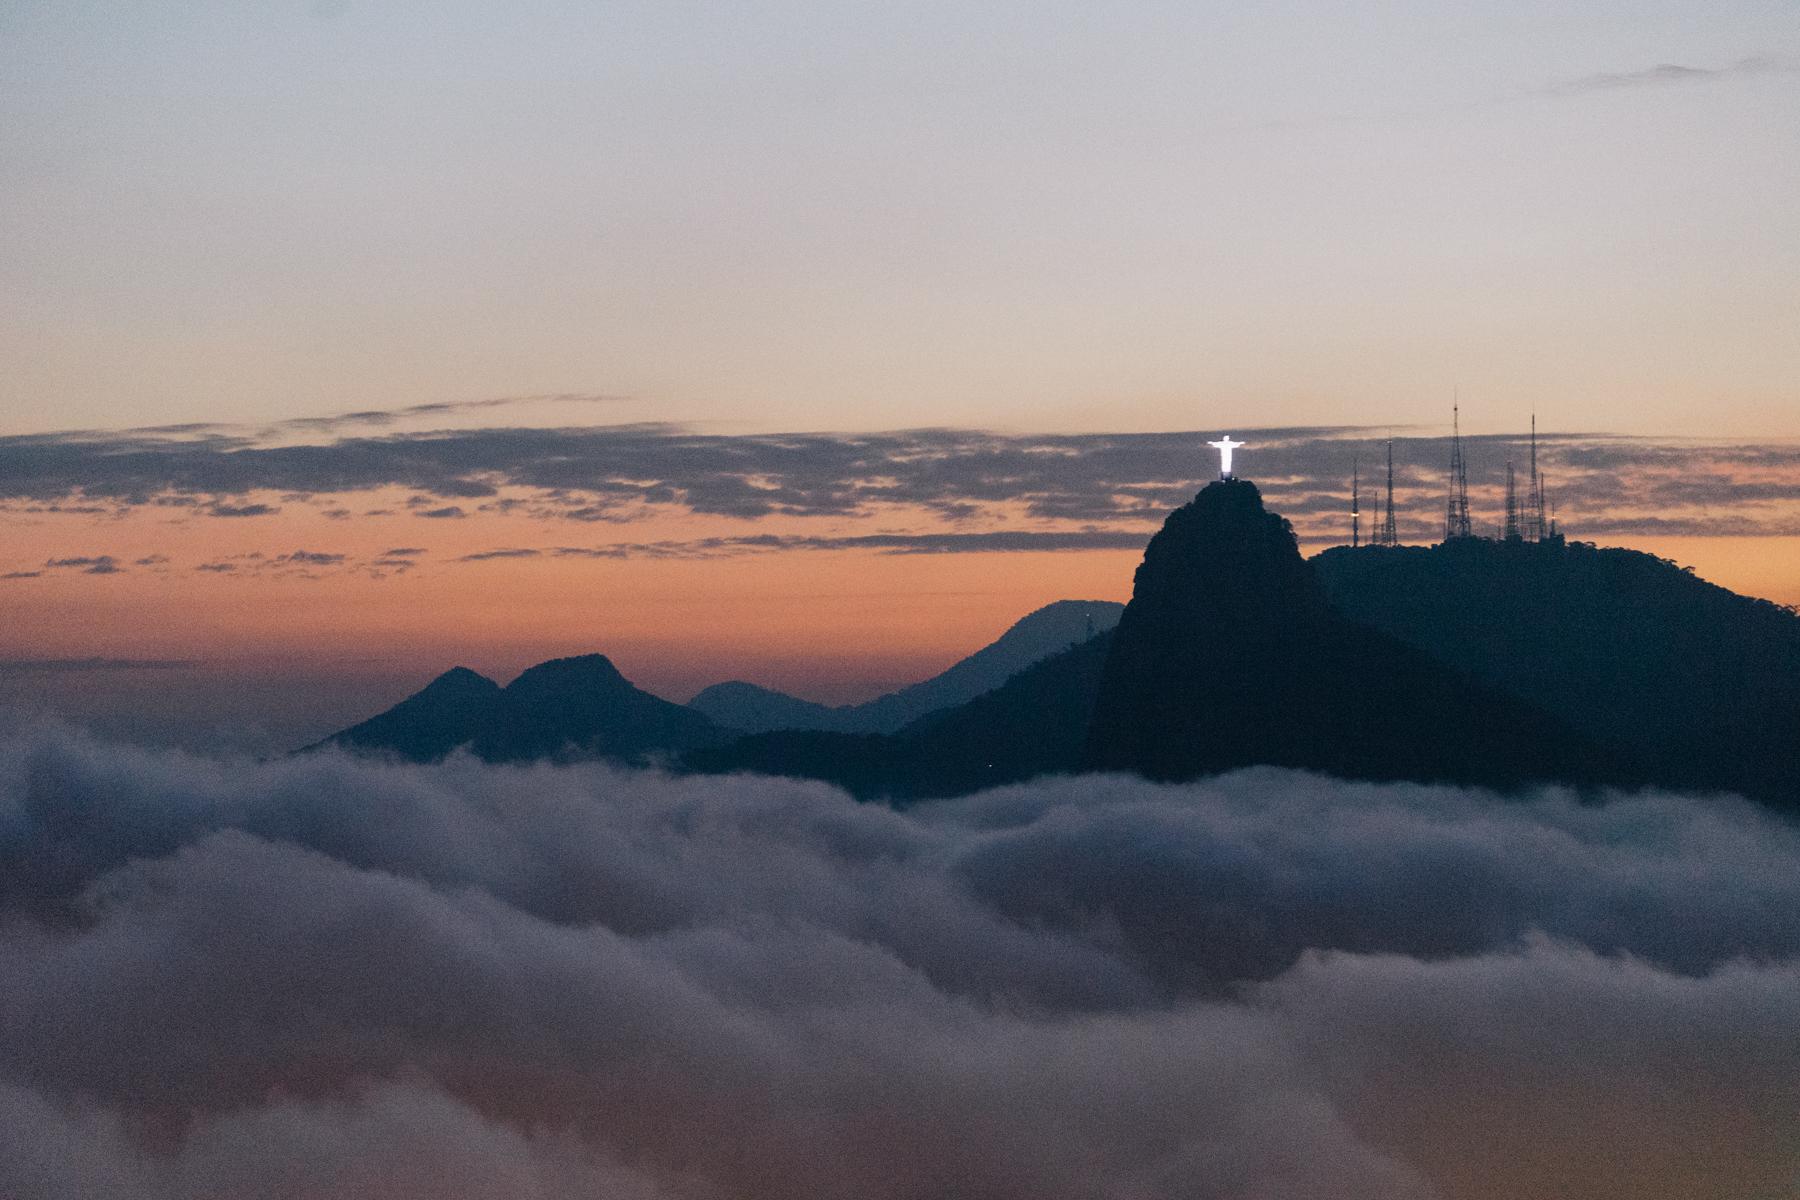 brazil-brasil-world-cup-olympics-rio-de-janeiro-sugar-loaf-pao-de-acucar-8